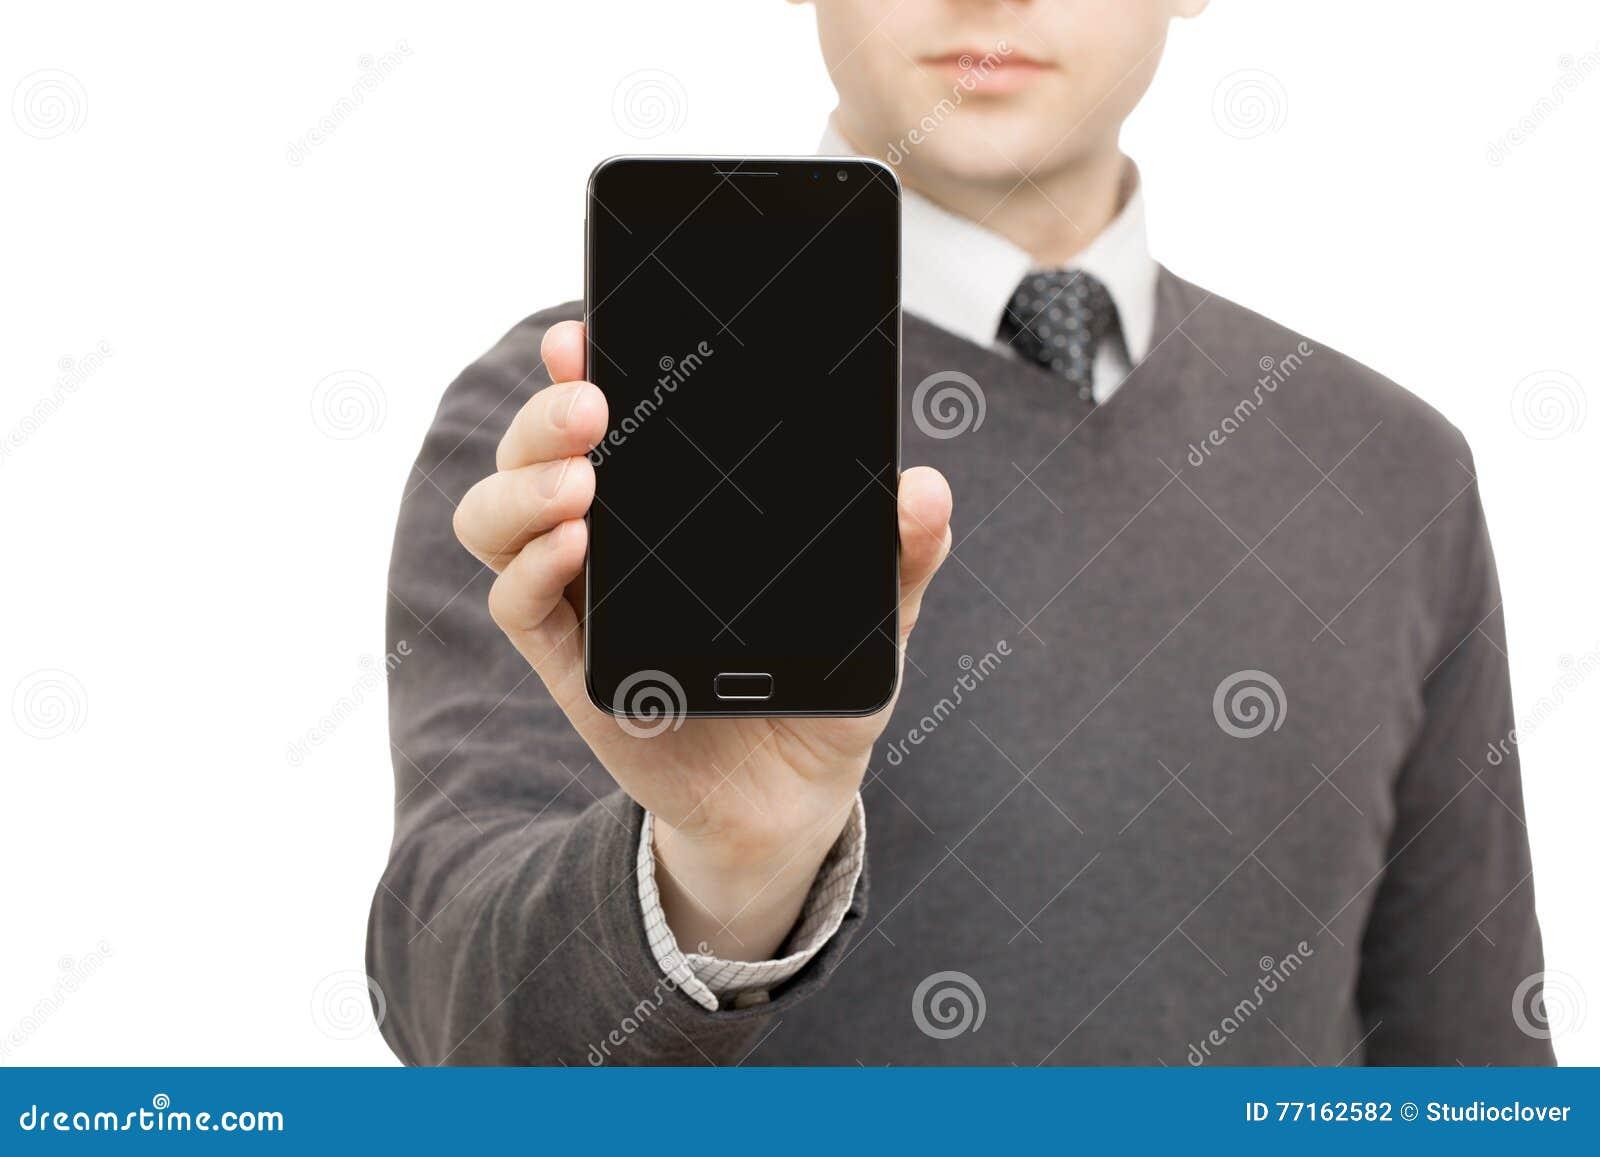 Instruments de Digital, comprimés et smartphones - mâle ne jugeant aucun smartphone de marque disponible